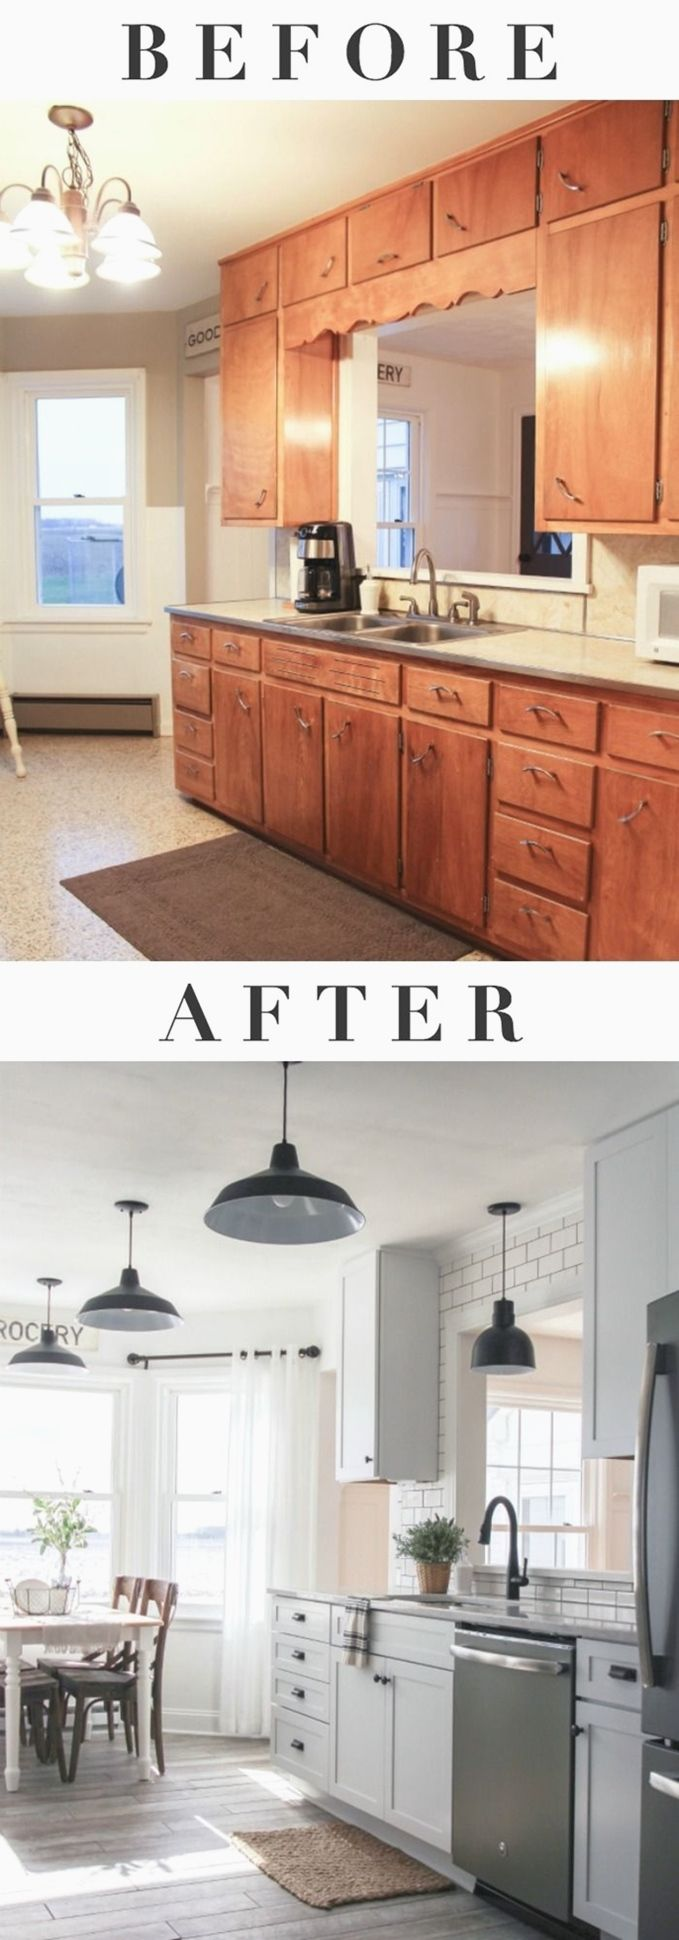 remodeling kitchen app | kitchen remodeling | pinterest | kitchen